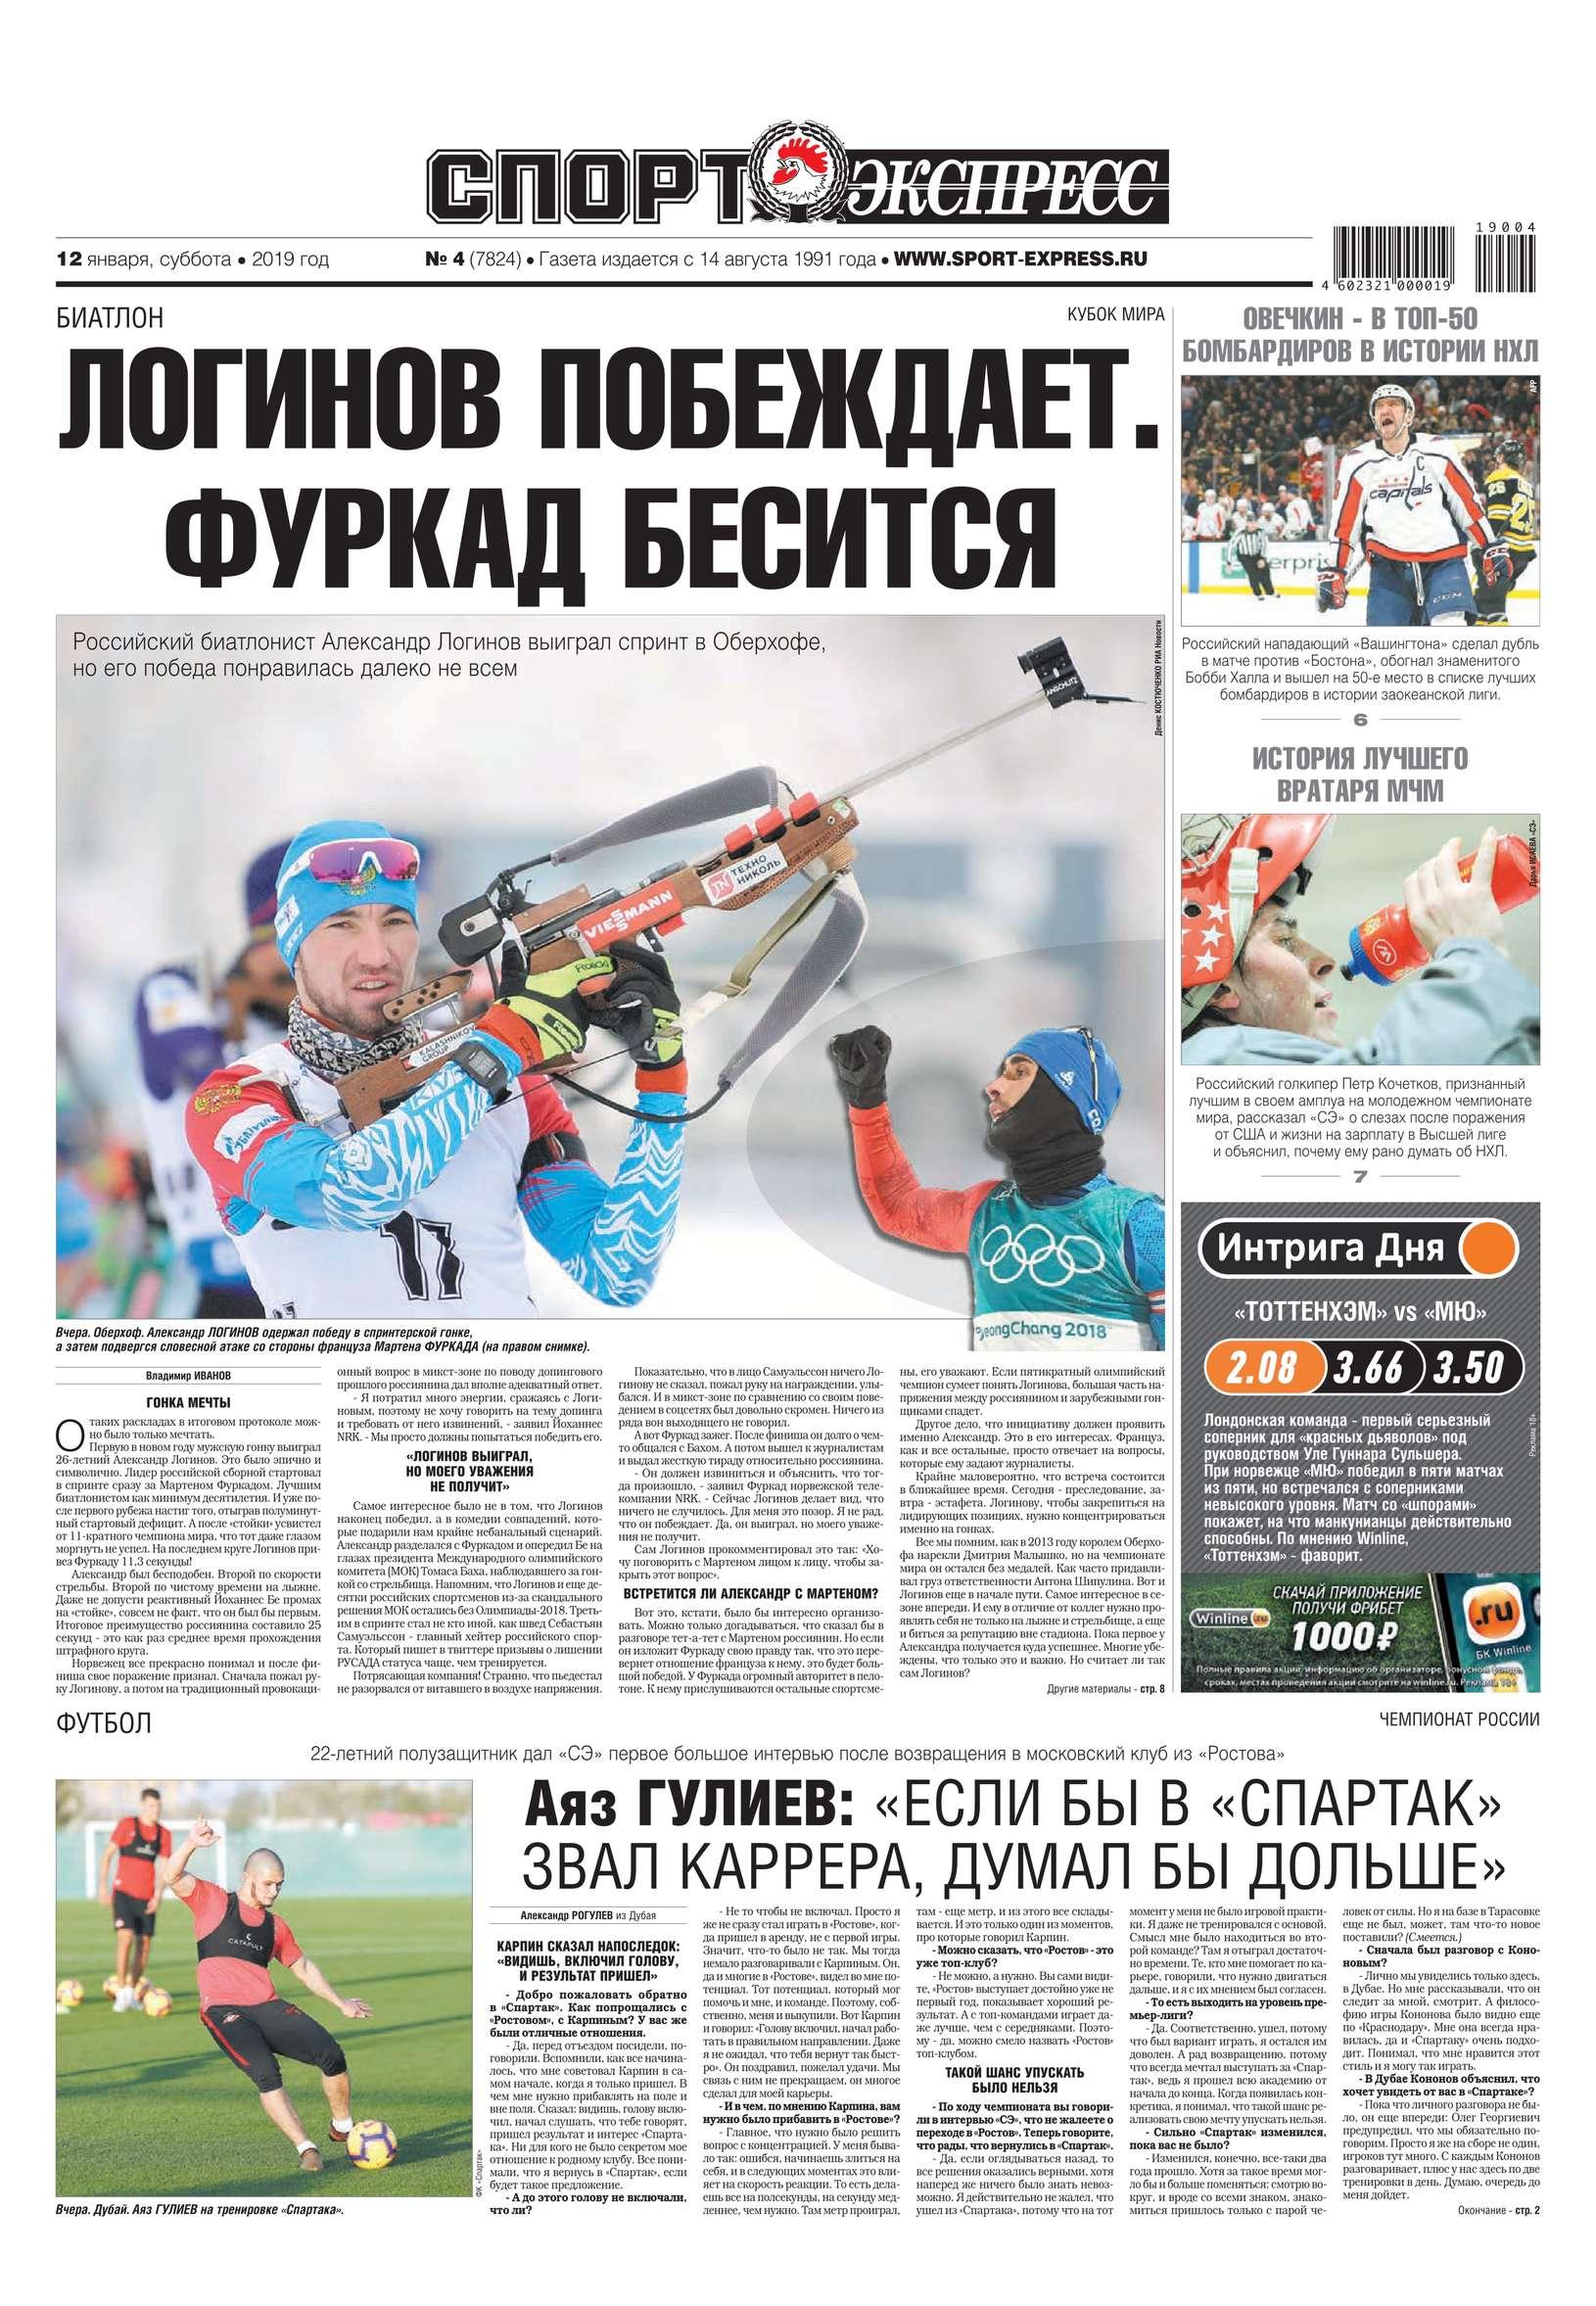 Спорт-экспресс 04-2019